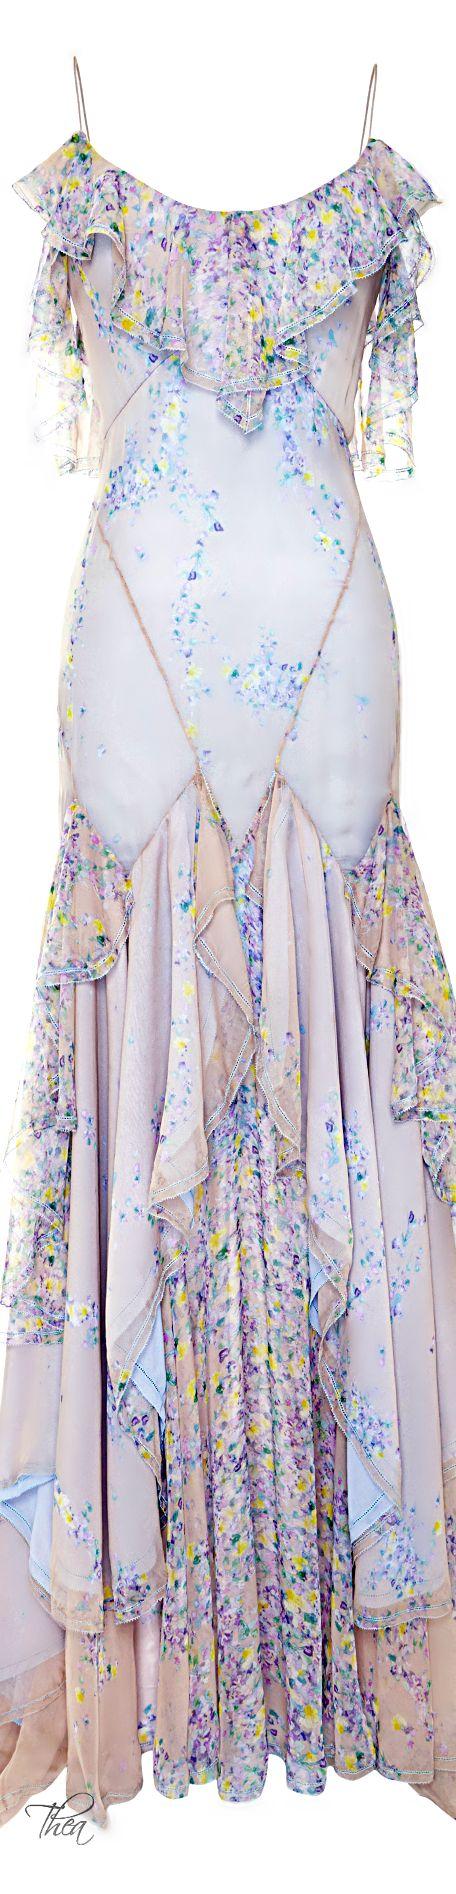 ~Zac Posen Wisteria Print Chiffon Gown | House of Beccaria